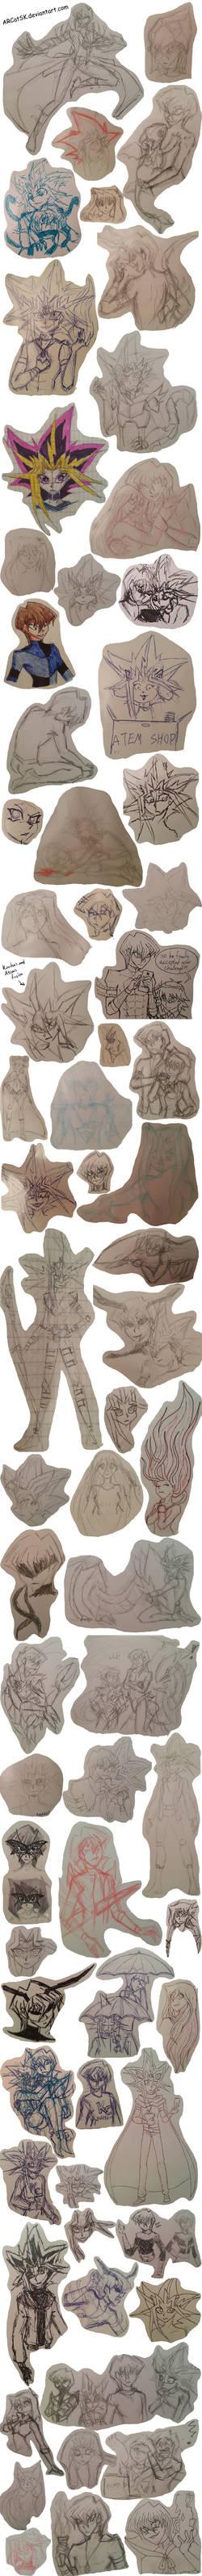 Yu--Gi-Oh! Sketchdump 4